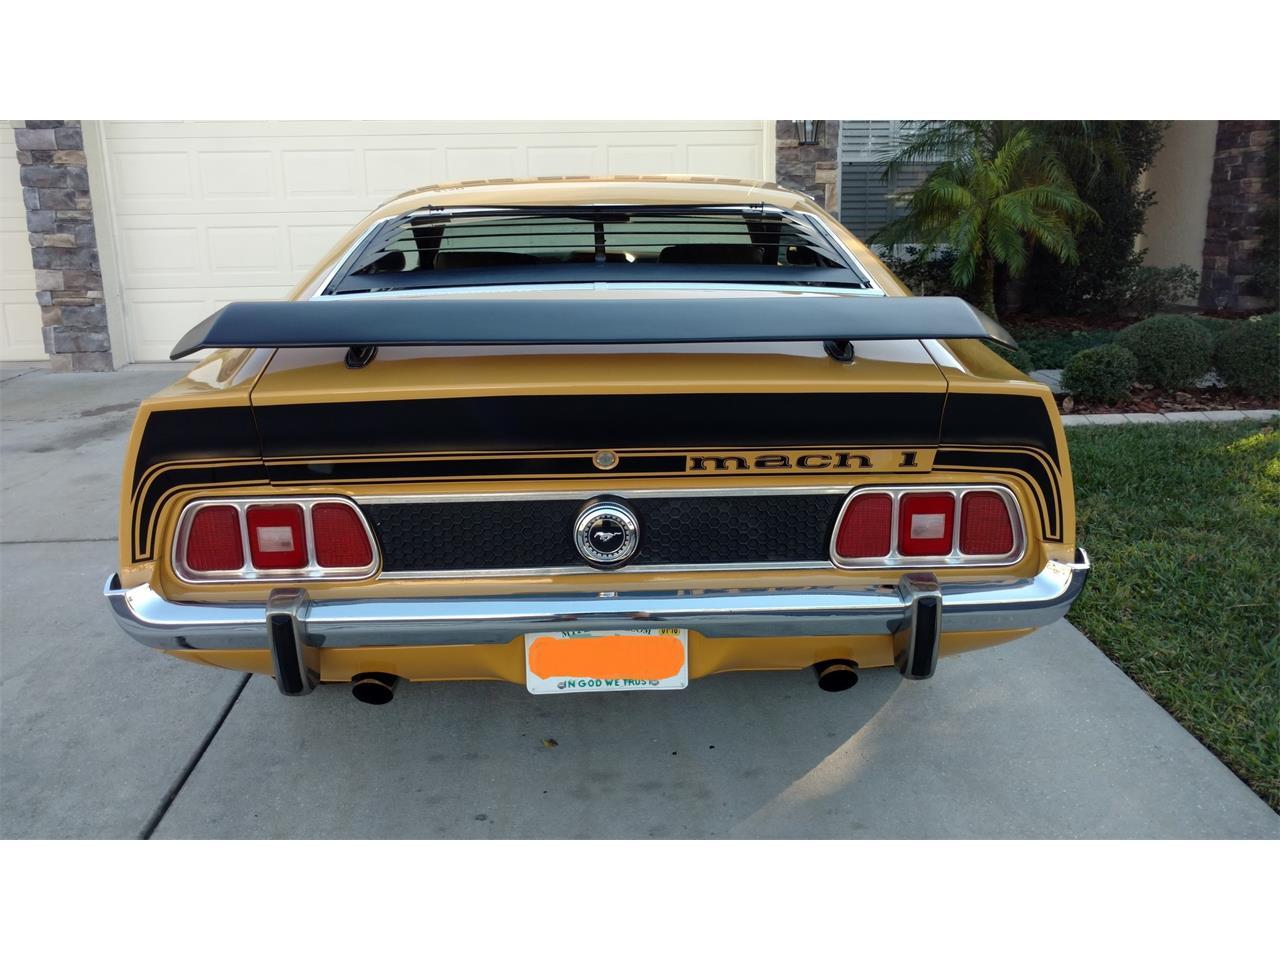 1973 Mach 1 Fuse Box Change Your Idea With Wiring Diagram Design 1970 Mustang Location Library Rh 69 Skriptoase De